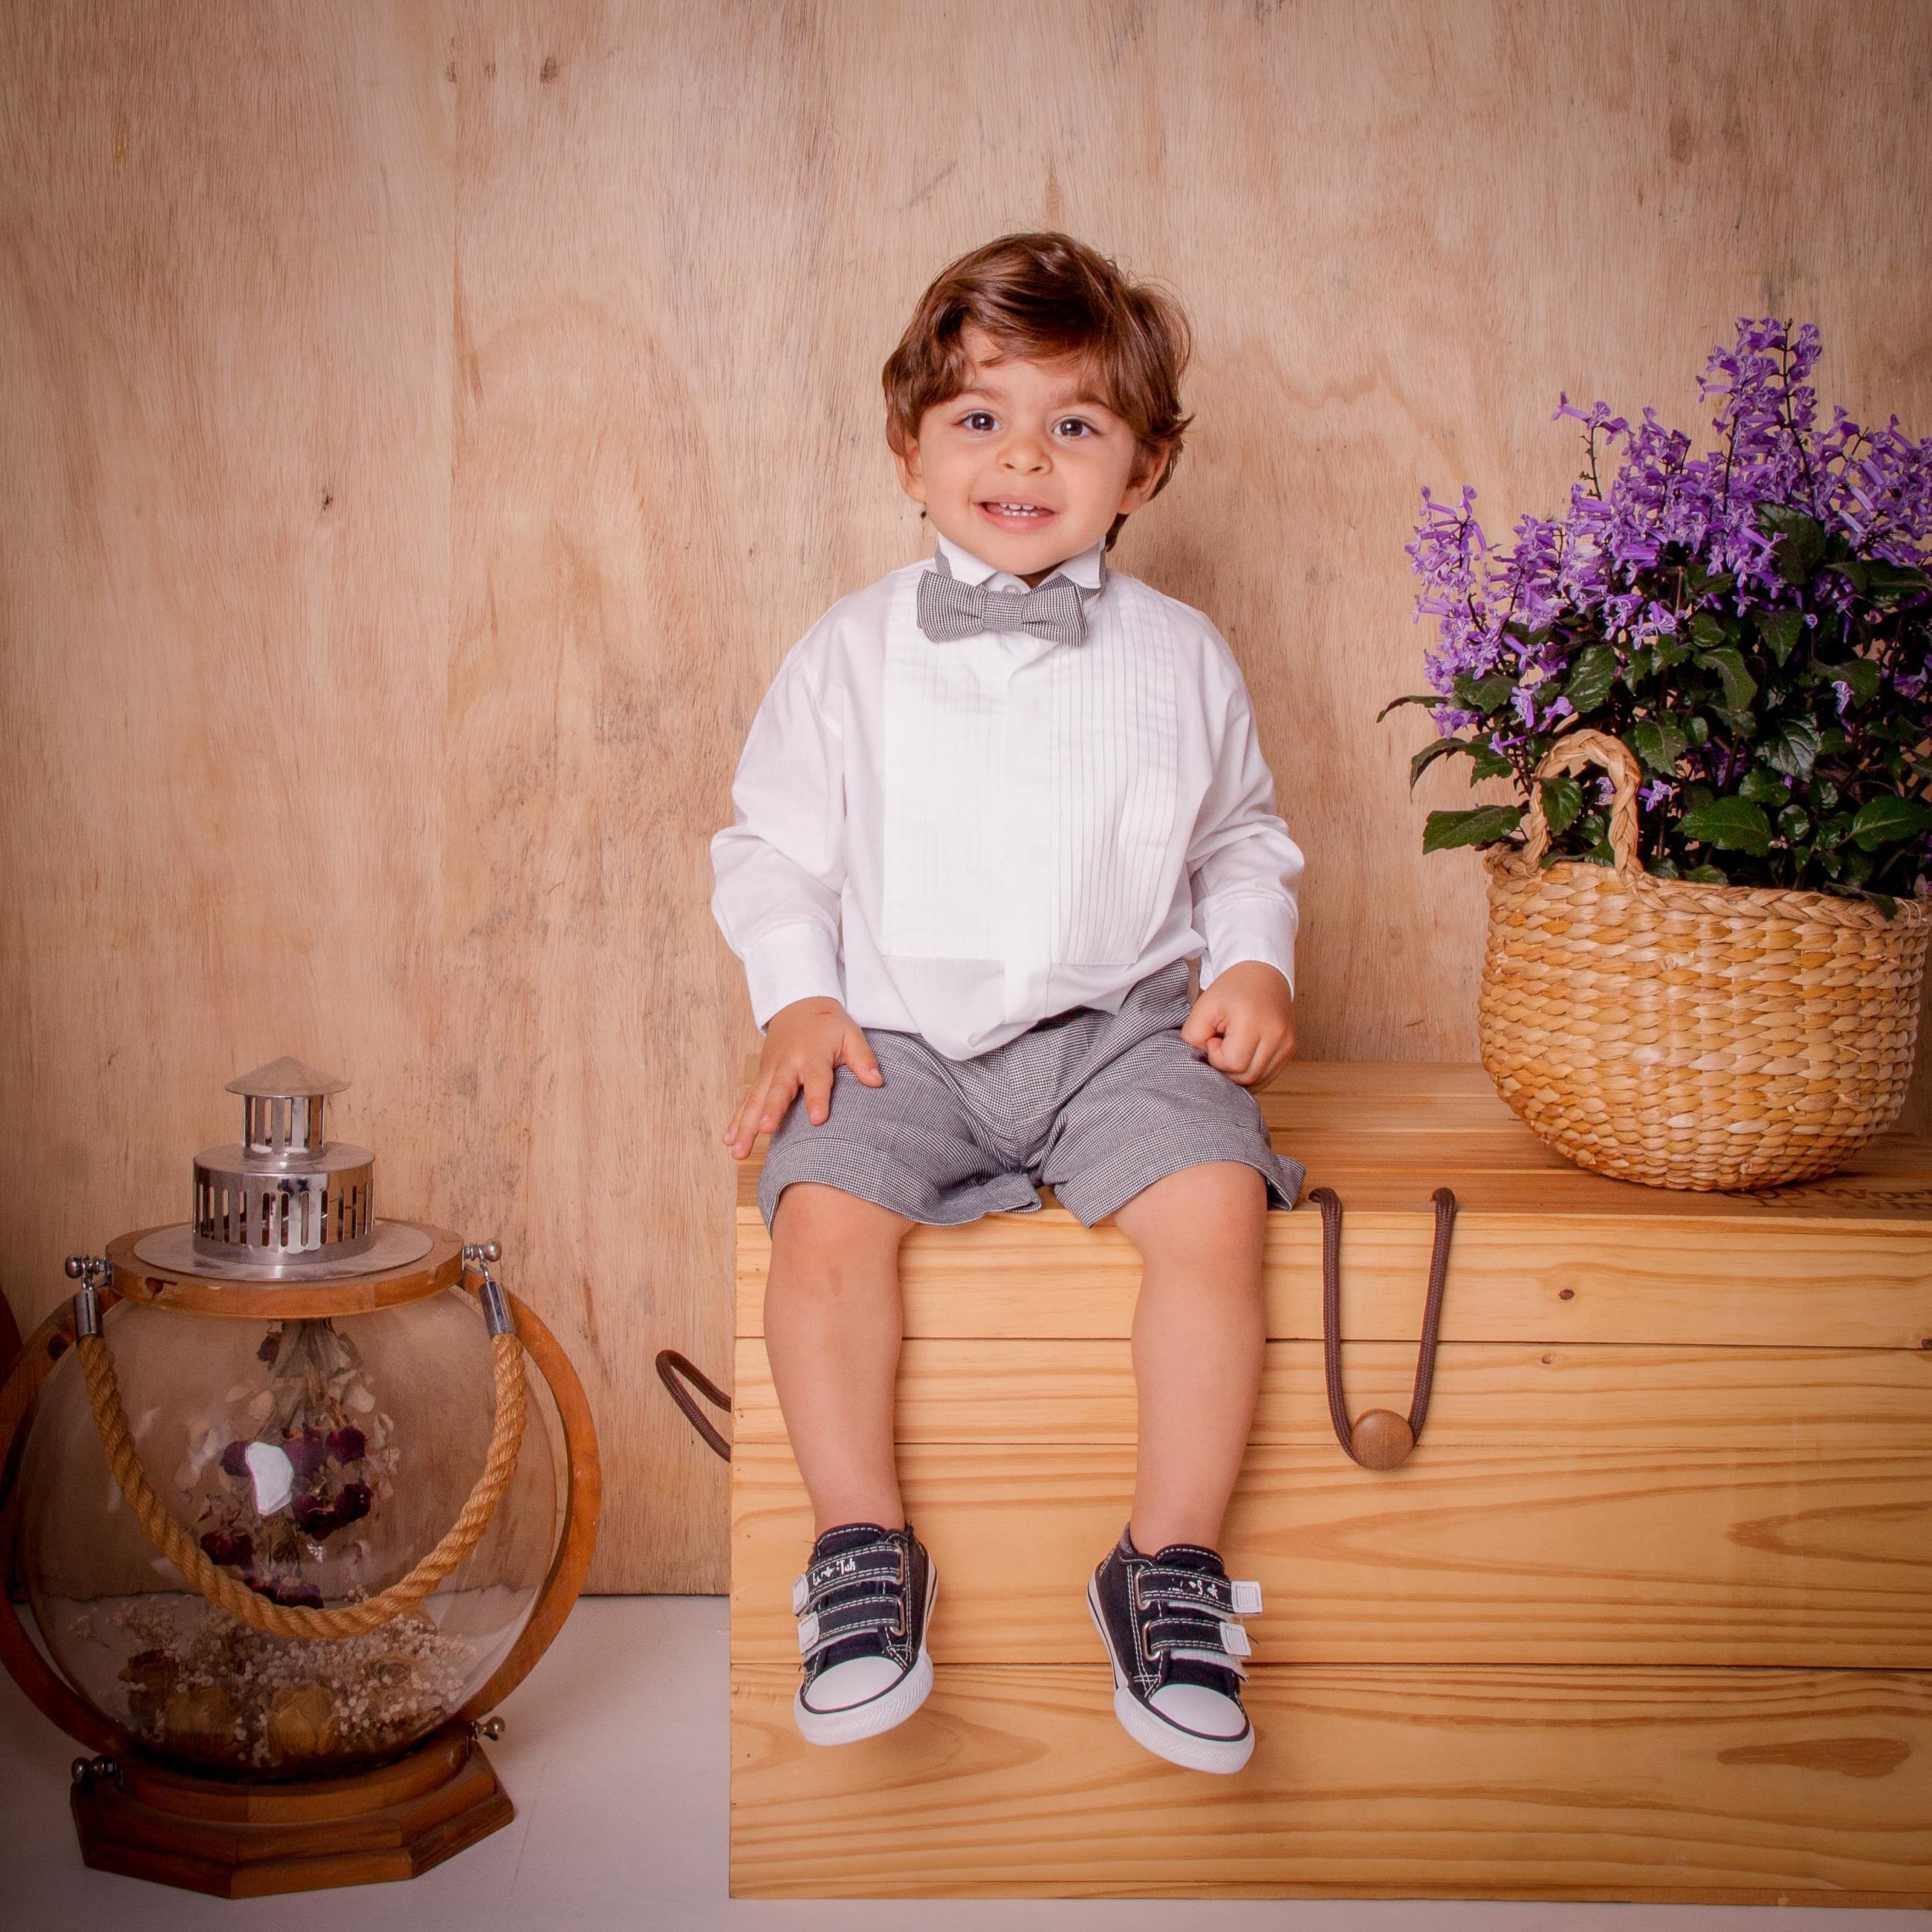 9 - Pajem de bermudinha cinza e gravata borboleta